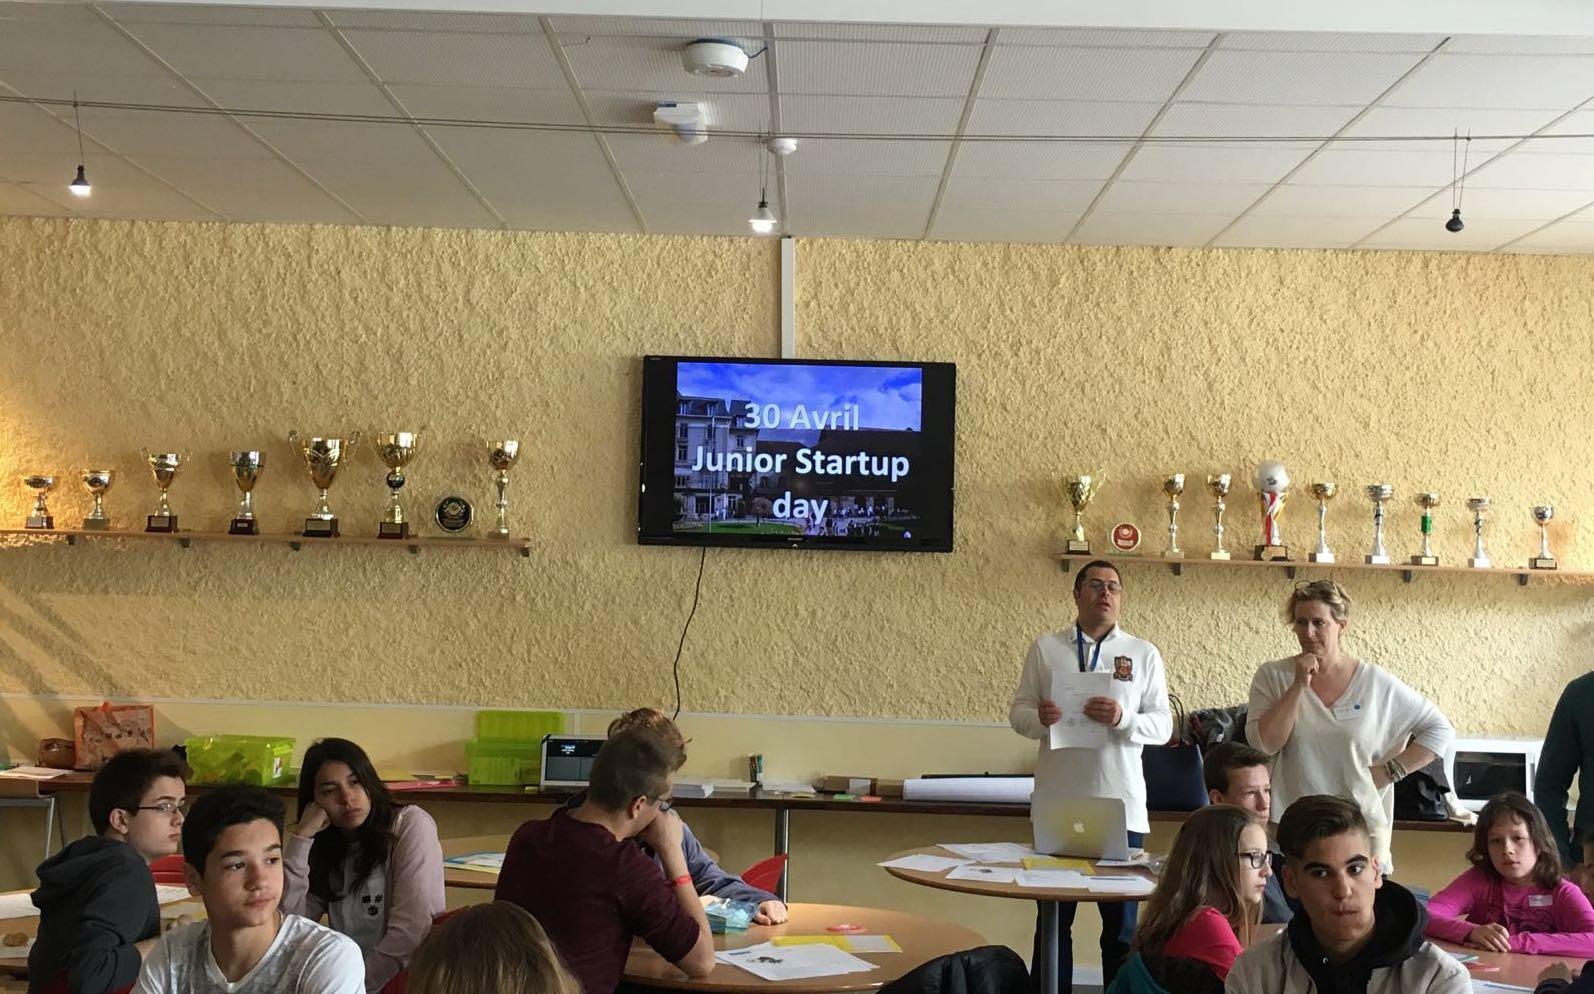 Junior startup day Graines Entrepreneurs CVCI Genilem accueil equipe atelier entrepreneur ecole ados